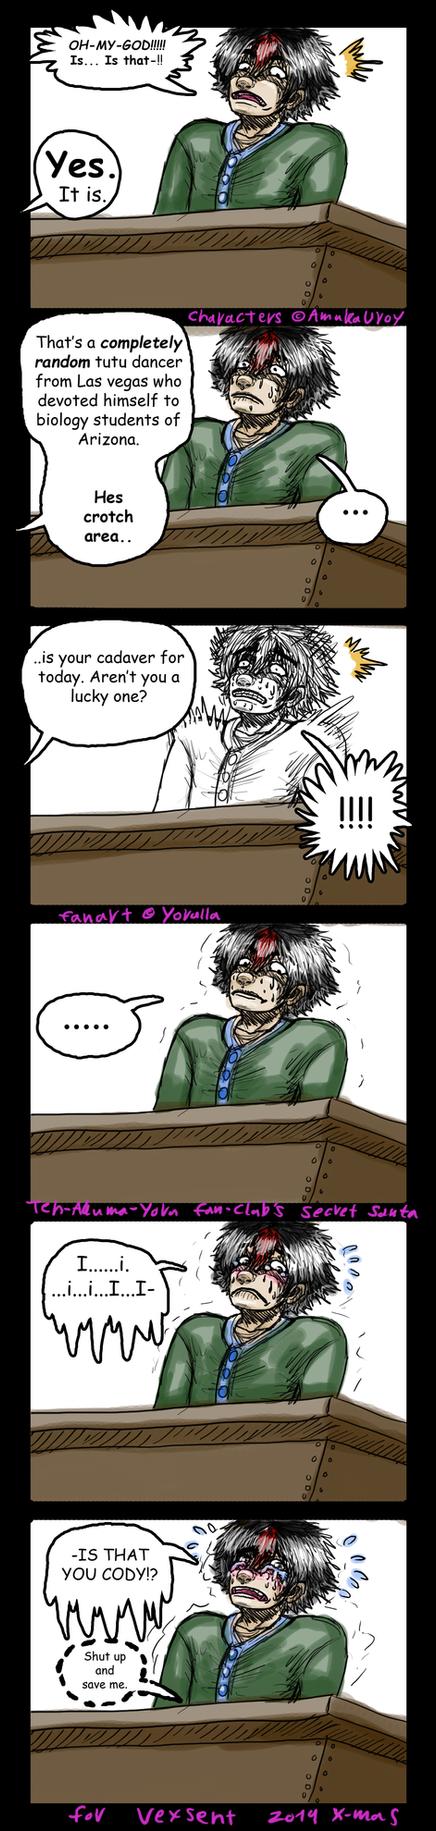 Secret Santa for Vexsent by Yorulla